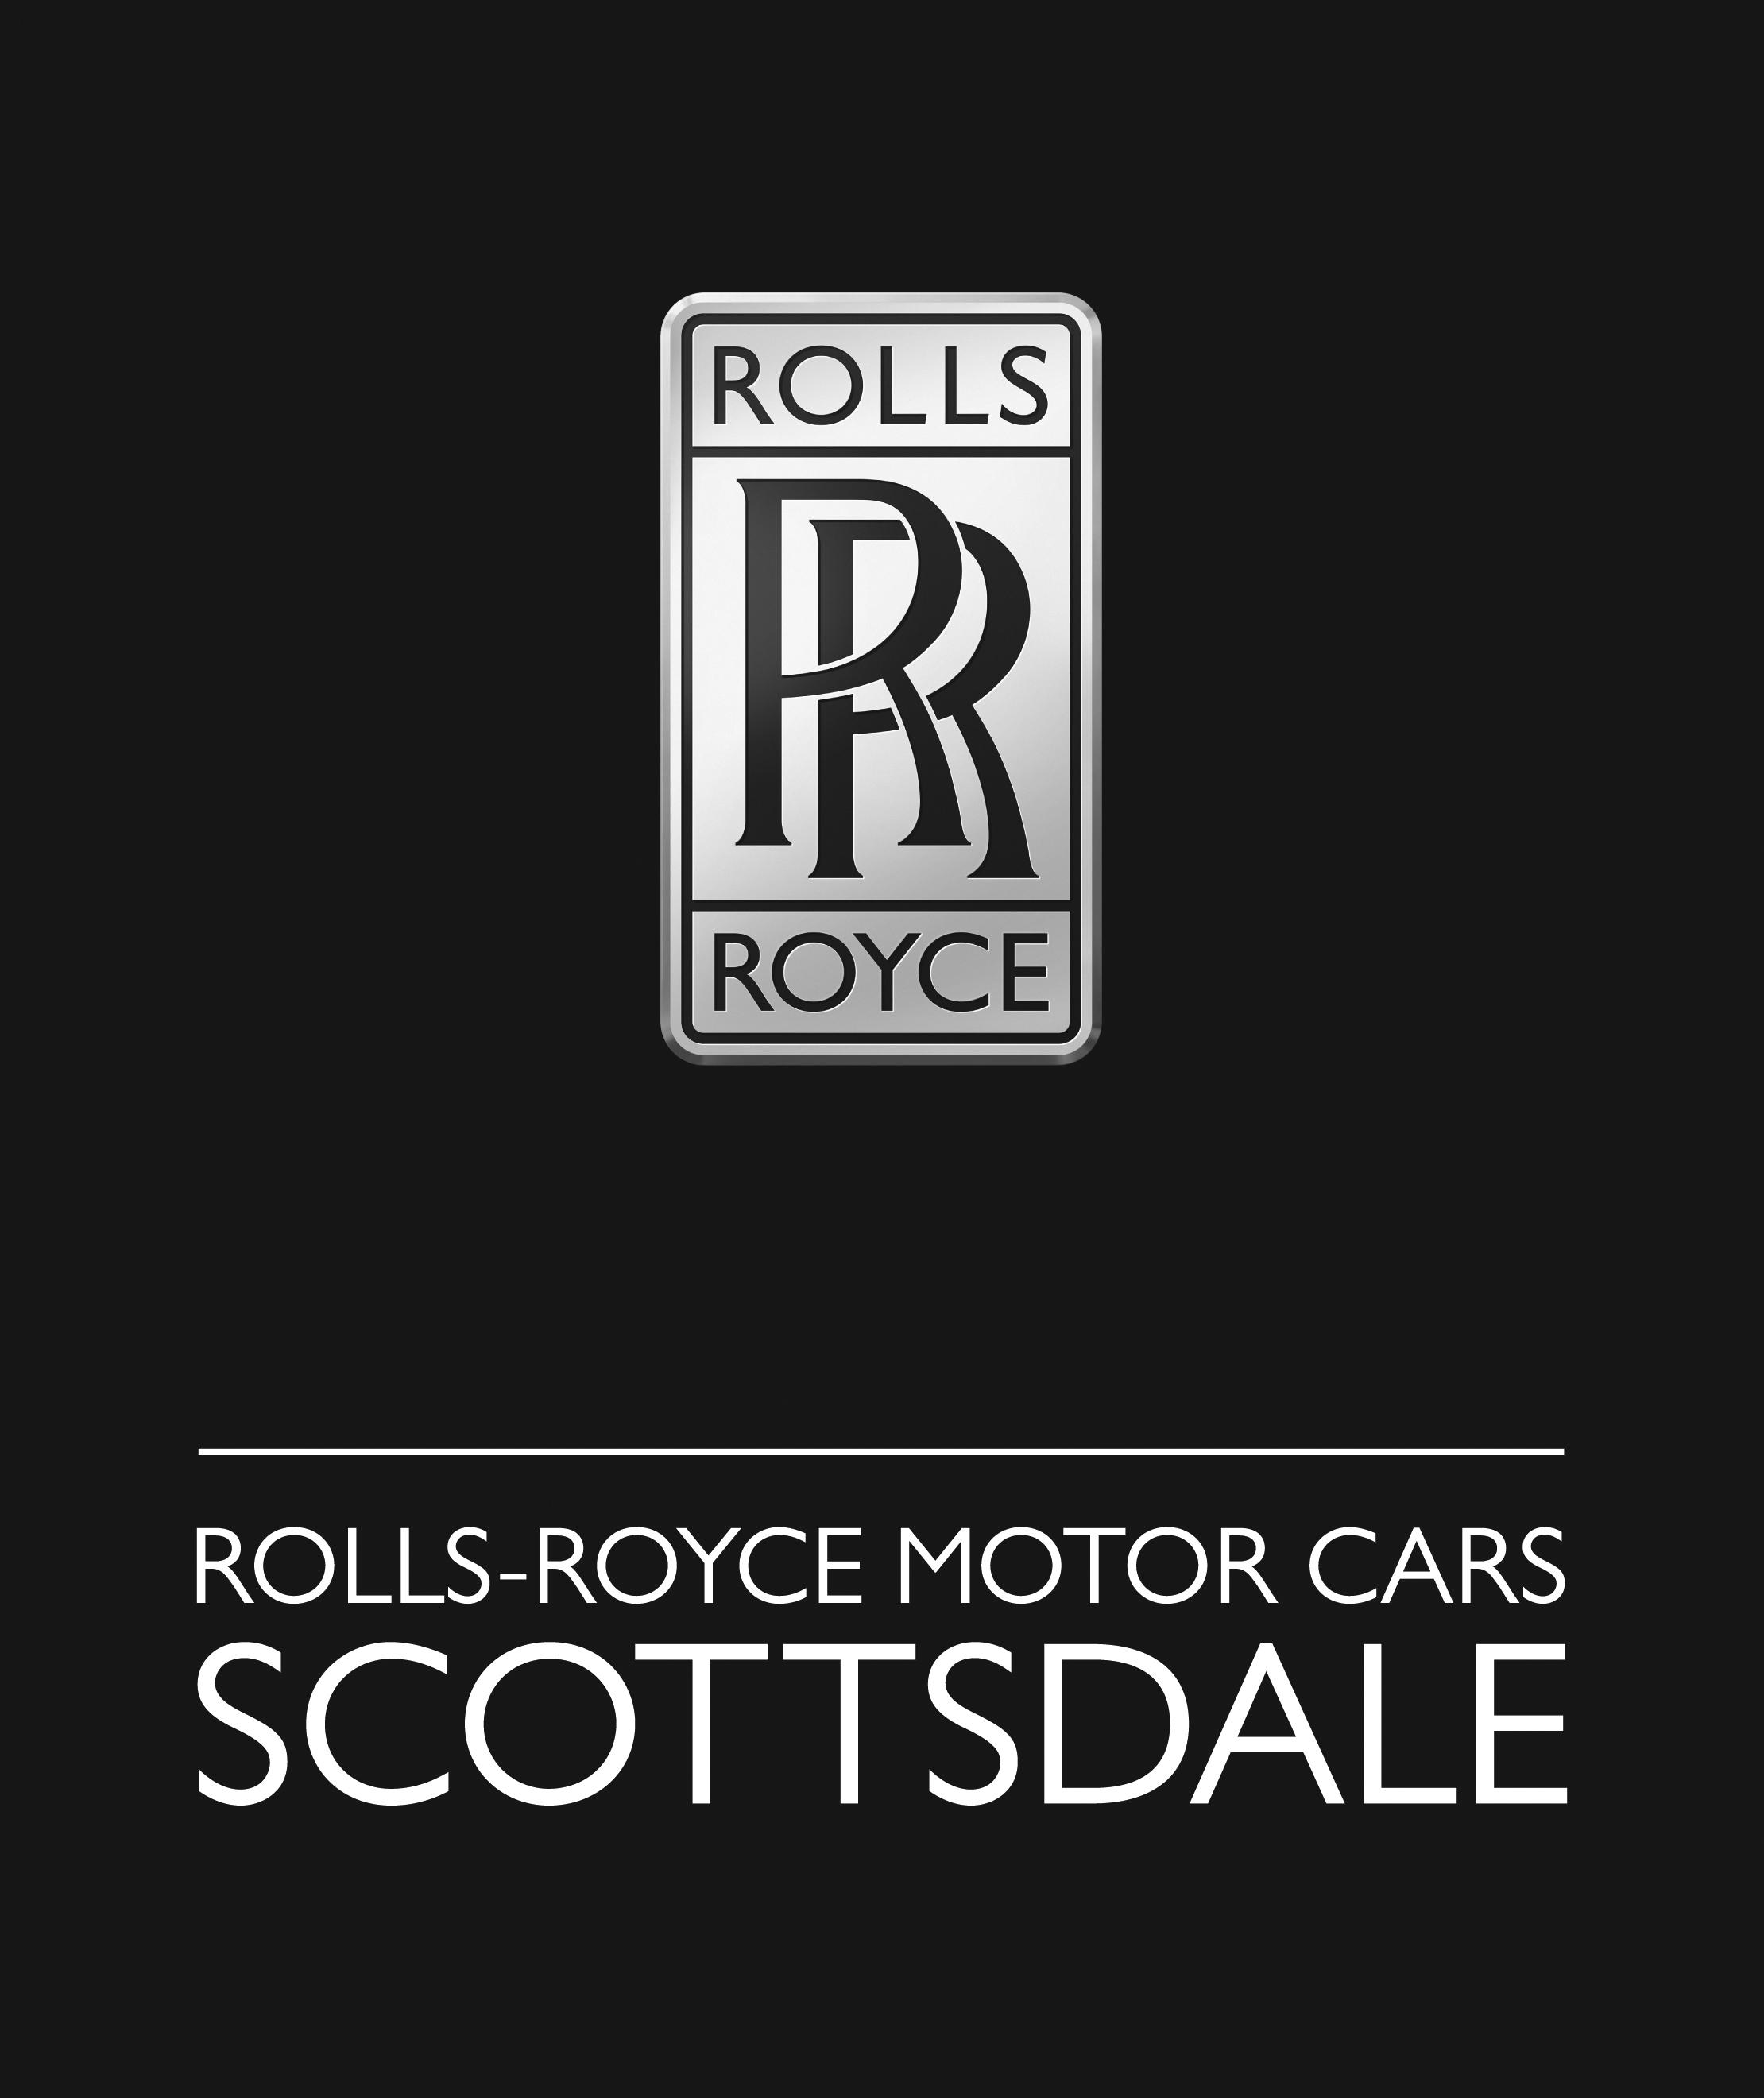 rolls-royce-motocars-scottsdale